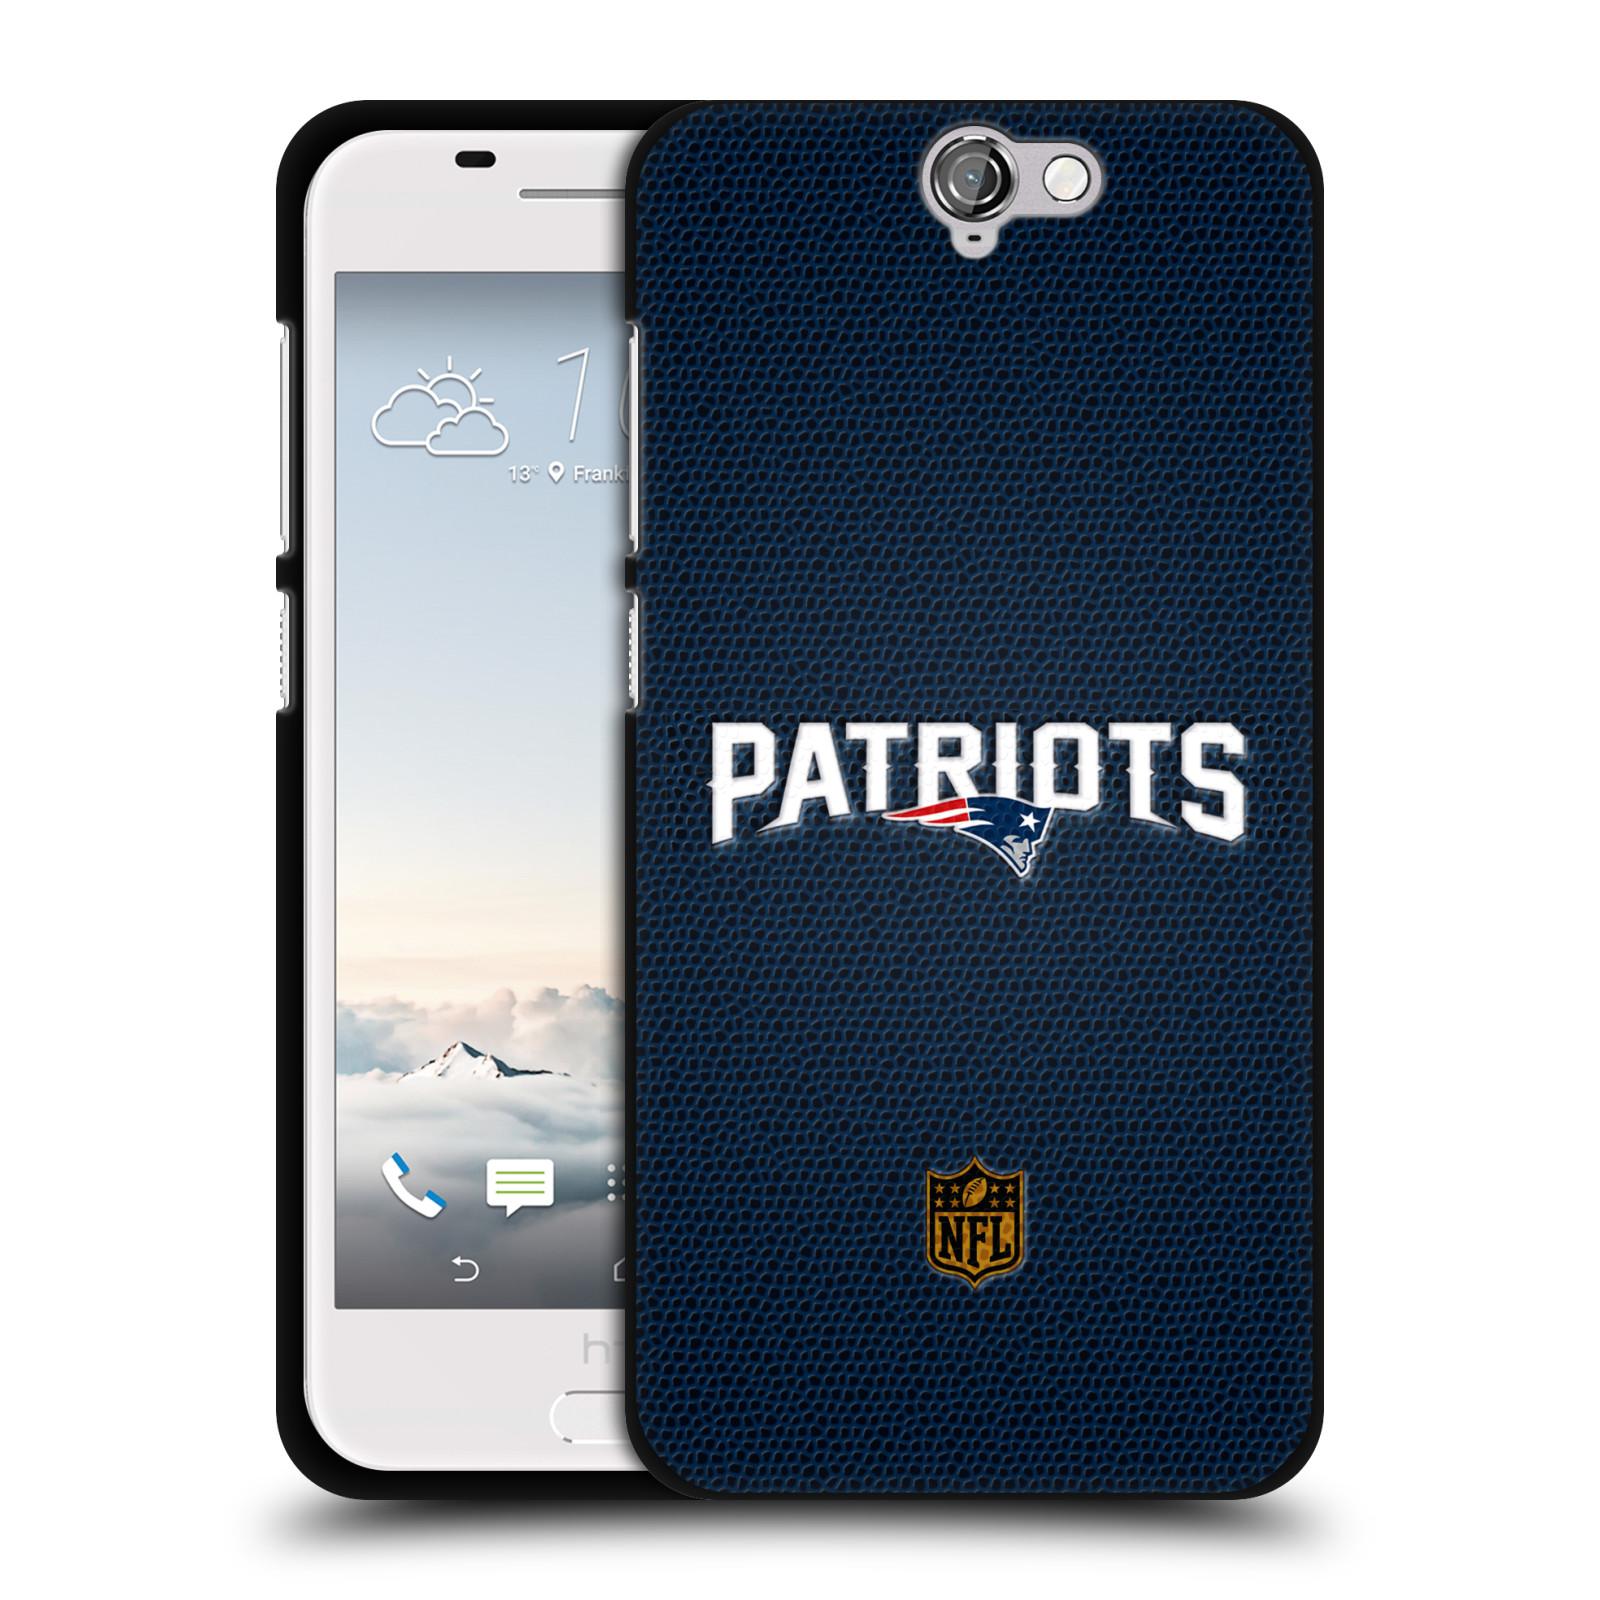 OFFICIAL-NFL-NEW-ENGLAND-PATRIOTS-LOGO-BLACK-SOFT-GEL-CASE-FOR-HTC-PHONES